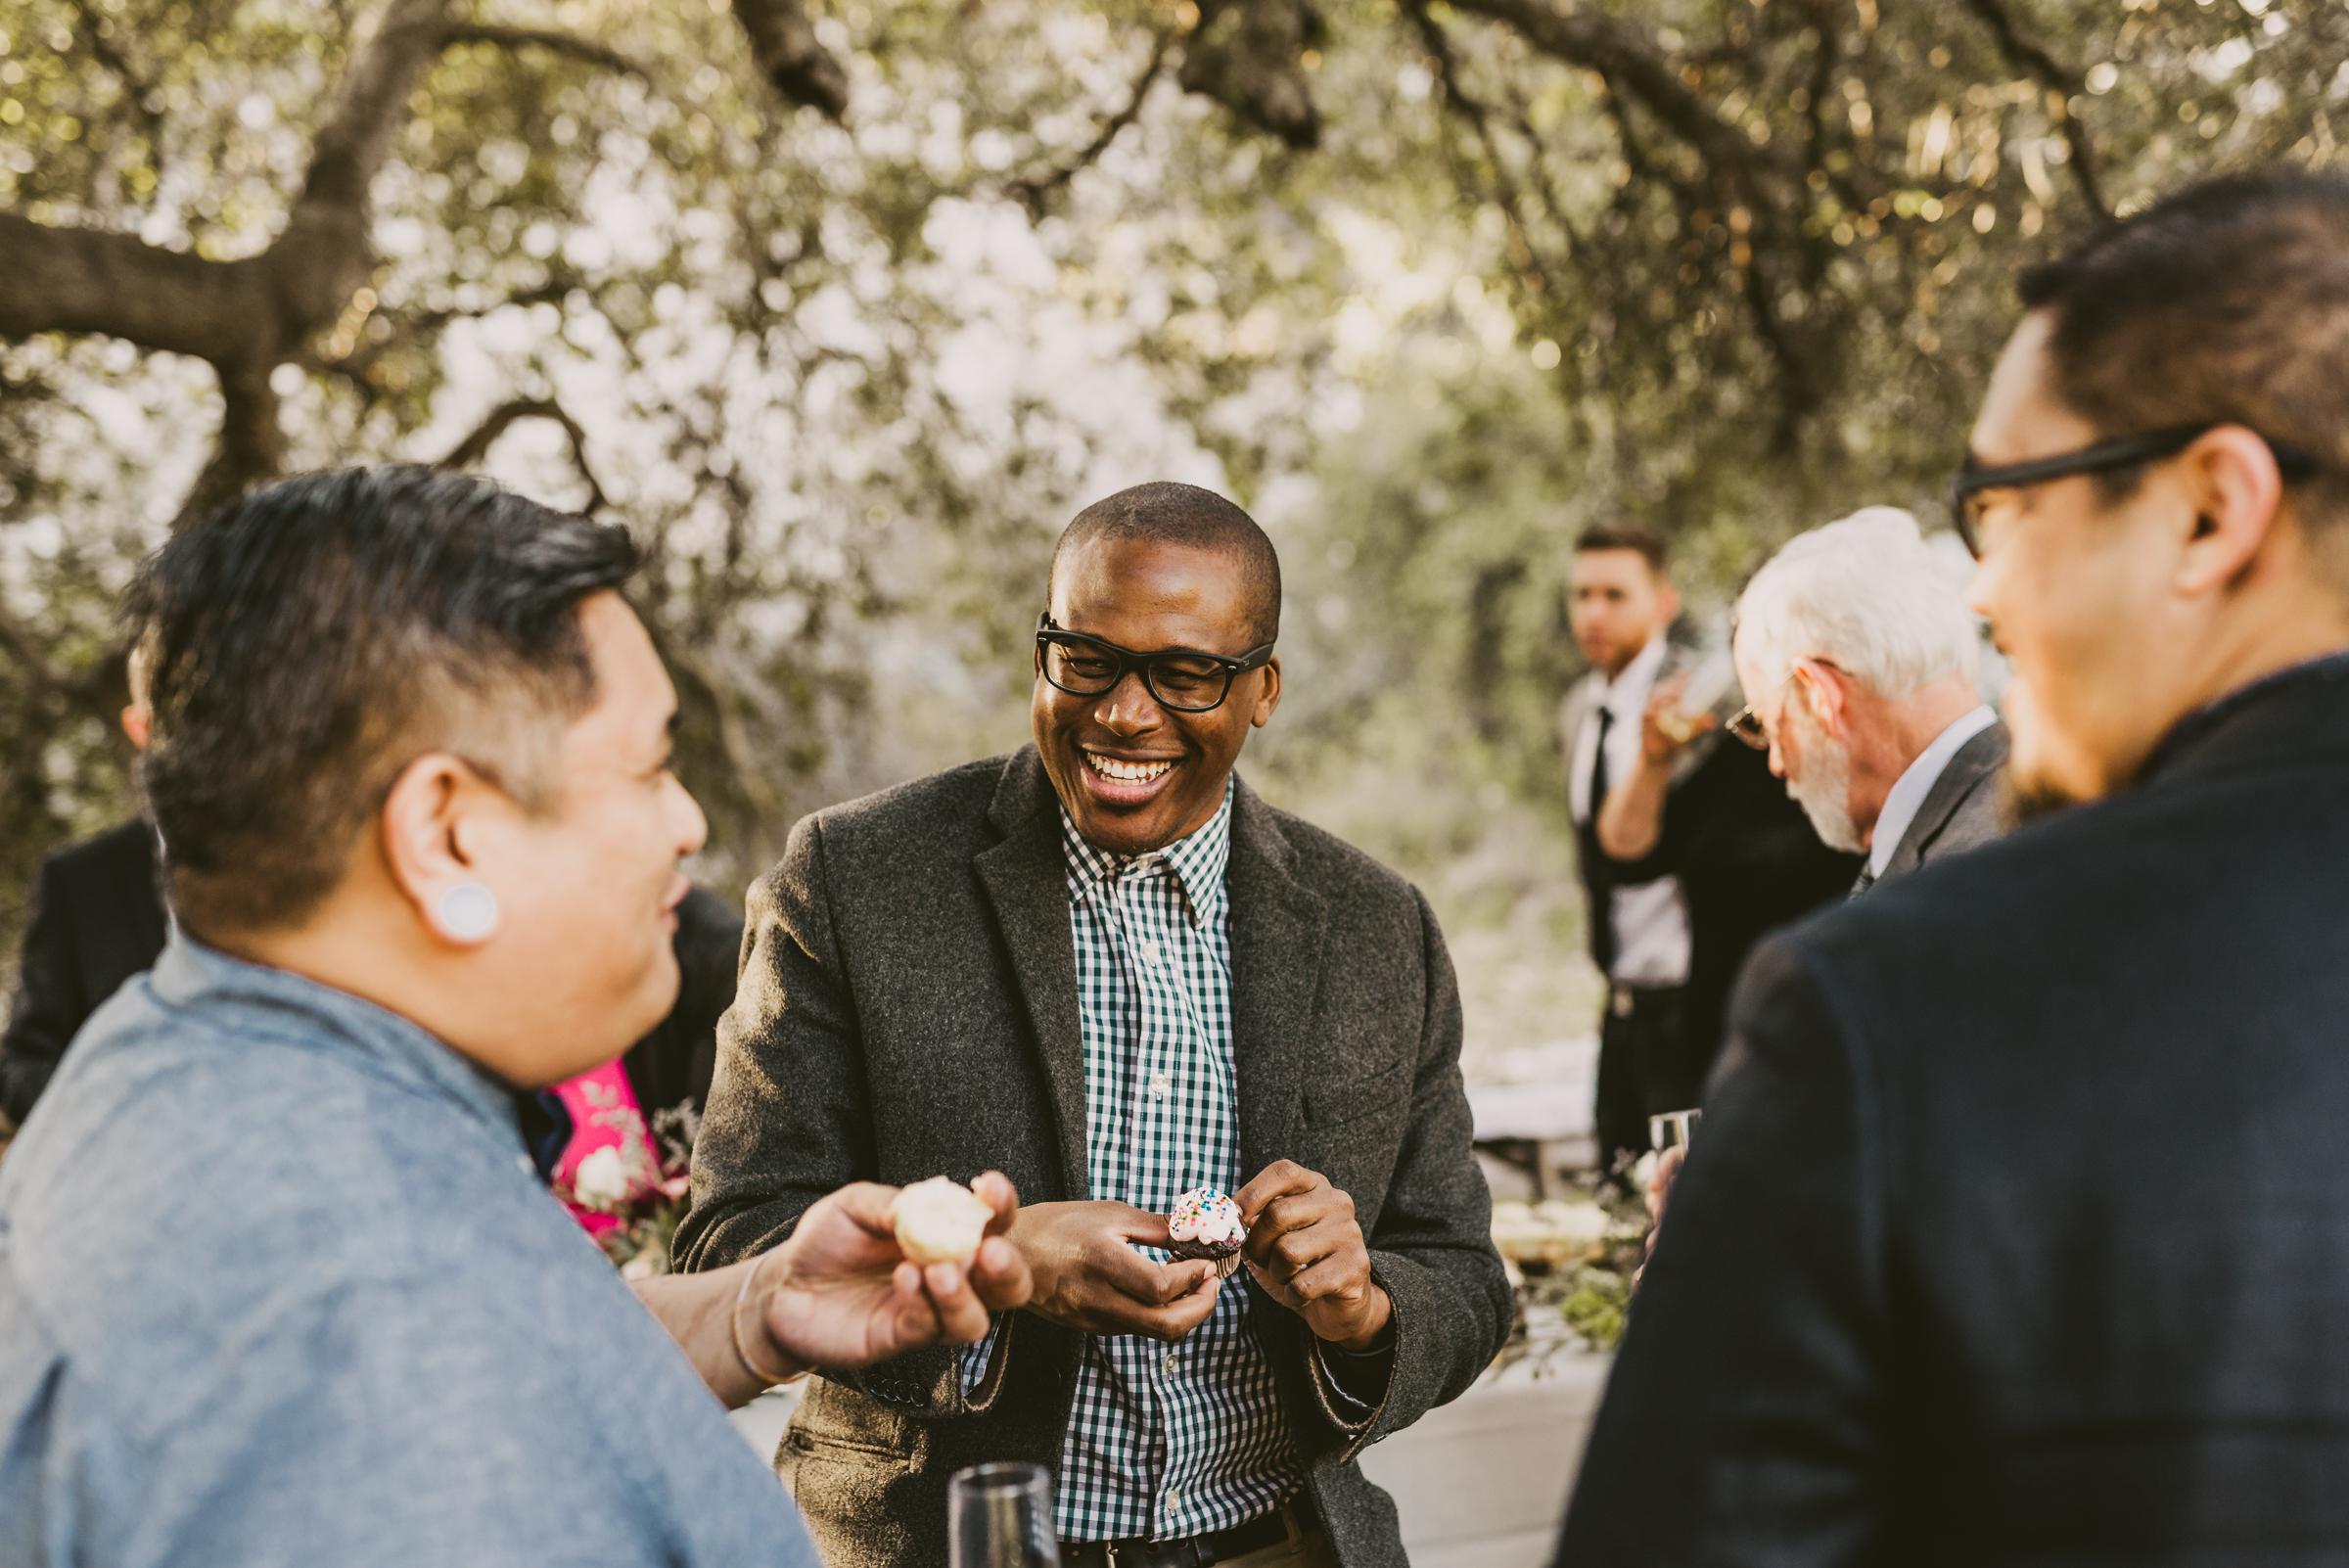 ©Isaiah + Taylor Photography - Intimate Elopement, Eaton Canyon, Los Angeles Wedding Photographer-50.jpg